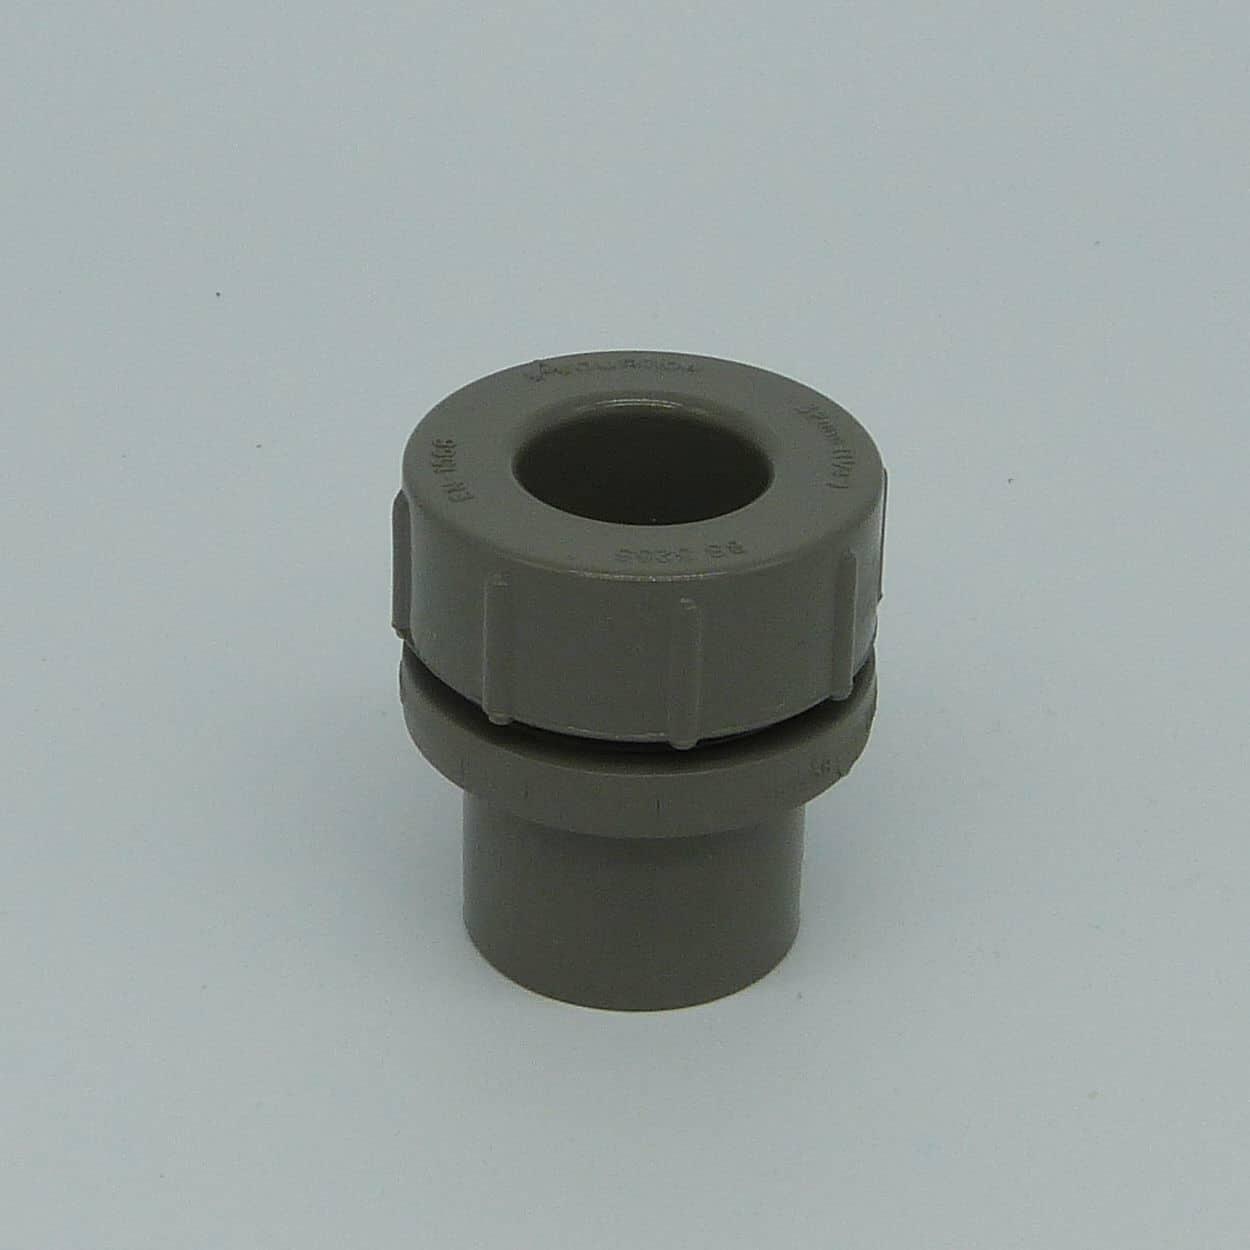 32mm solvent weld screw access cap grey